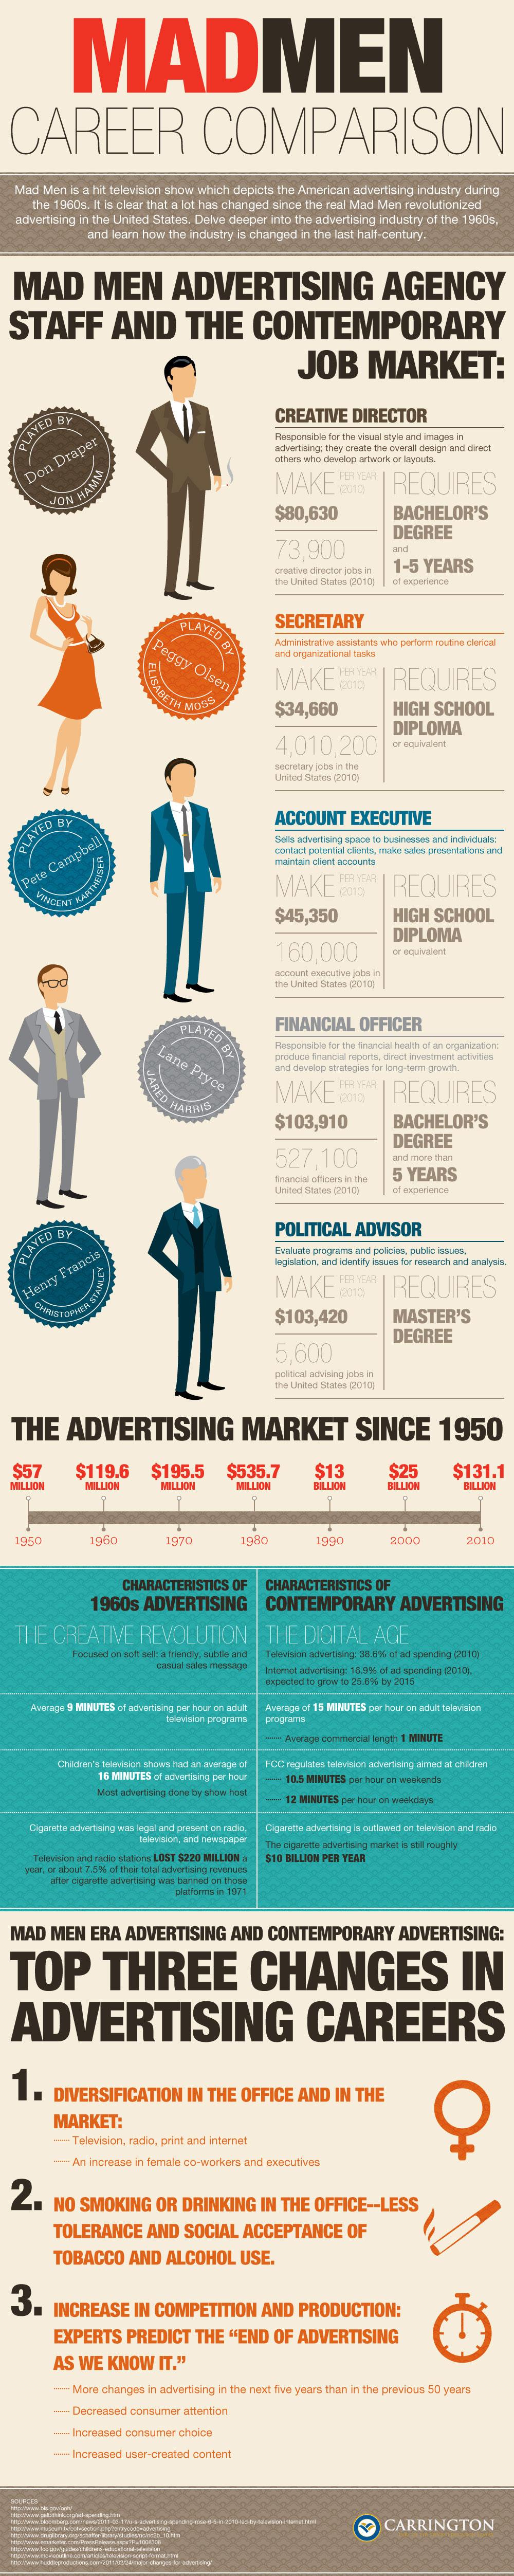 Mad-Men-Career-Comparison-infographic